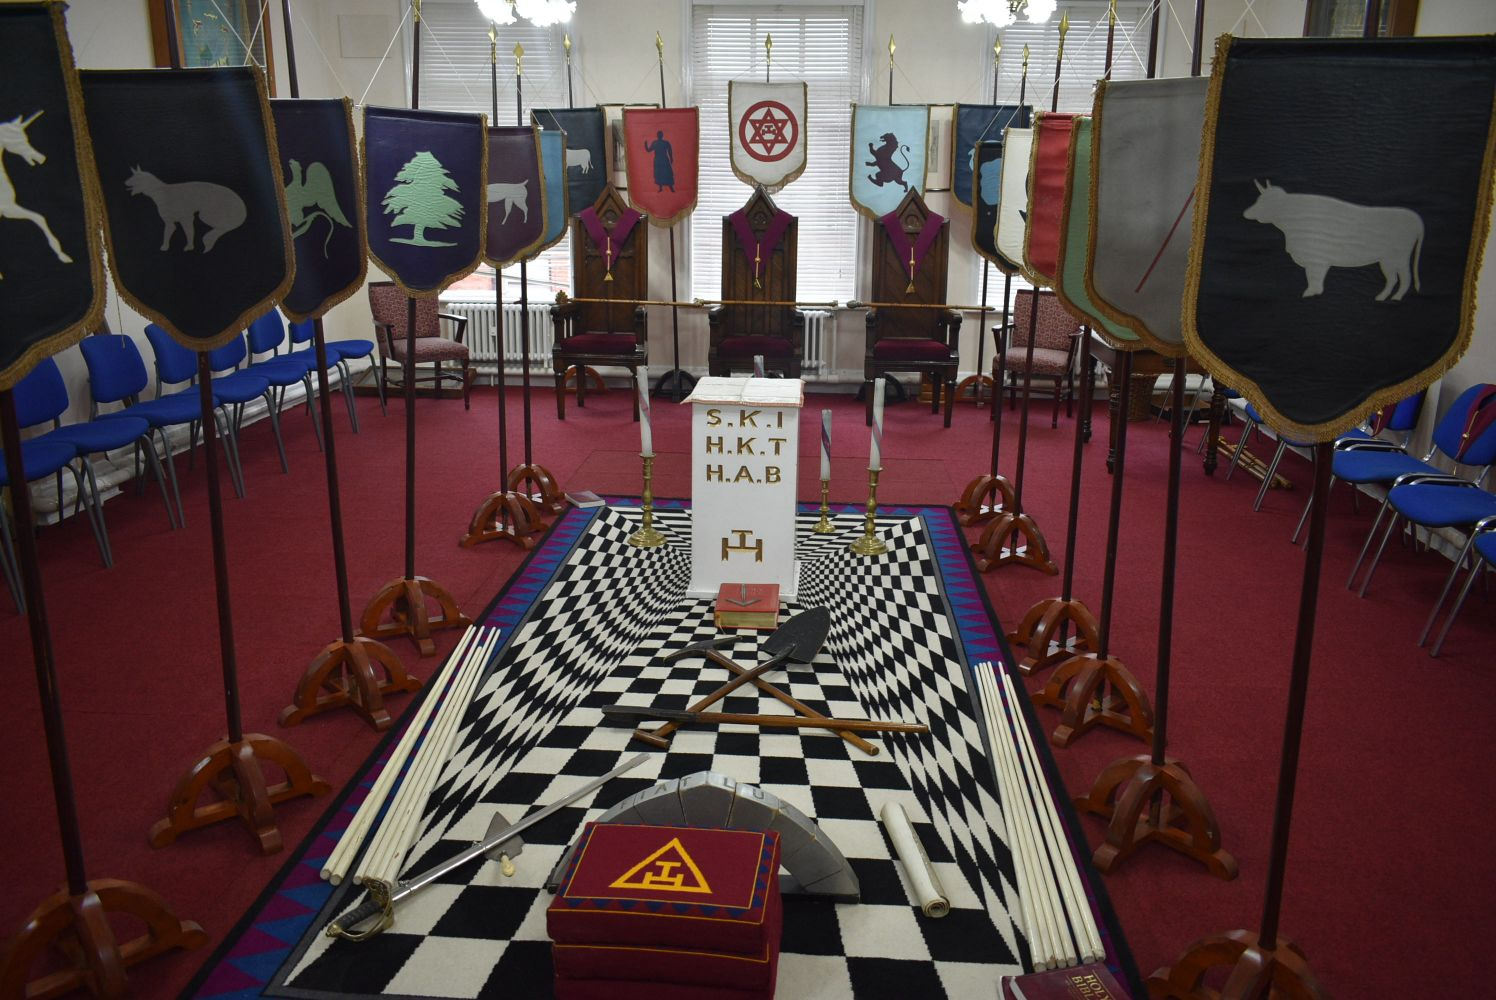 Masonic Lodge Furnishings & Regalia and Kitchen, Restaurant & Bar Equipment